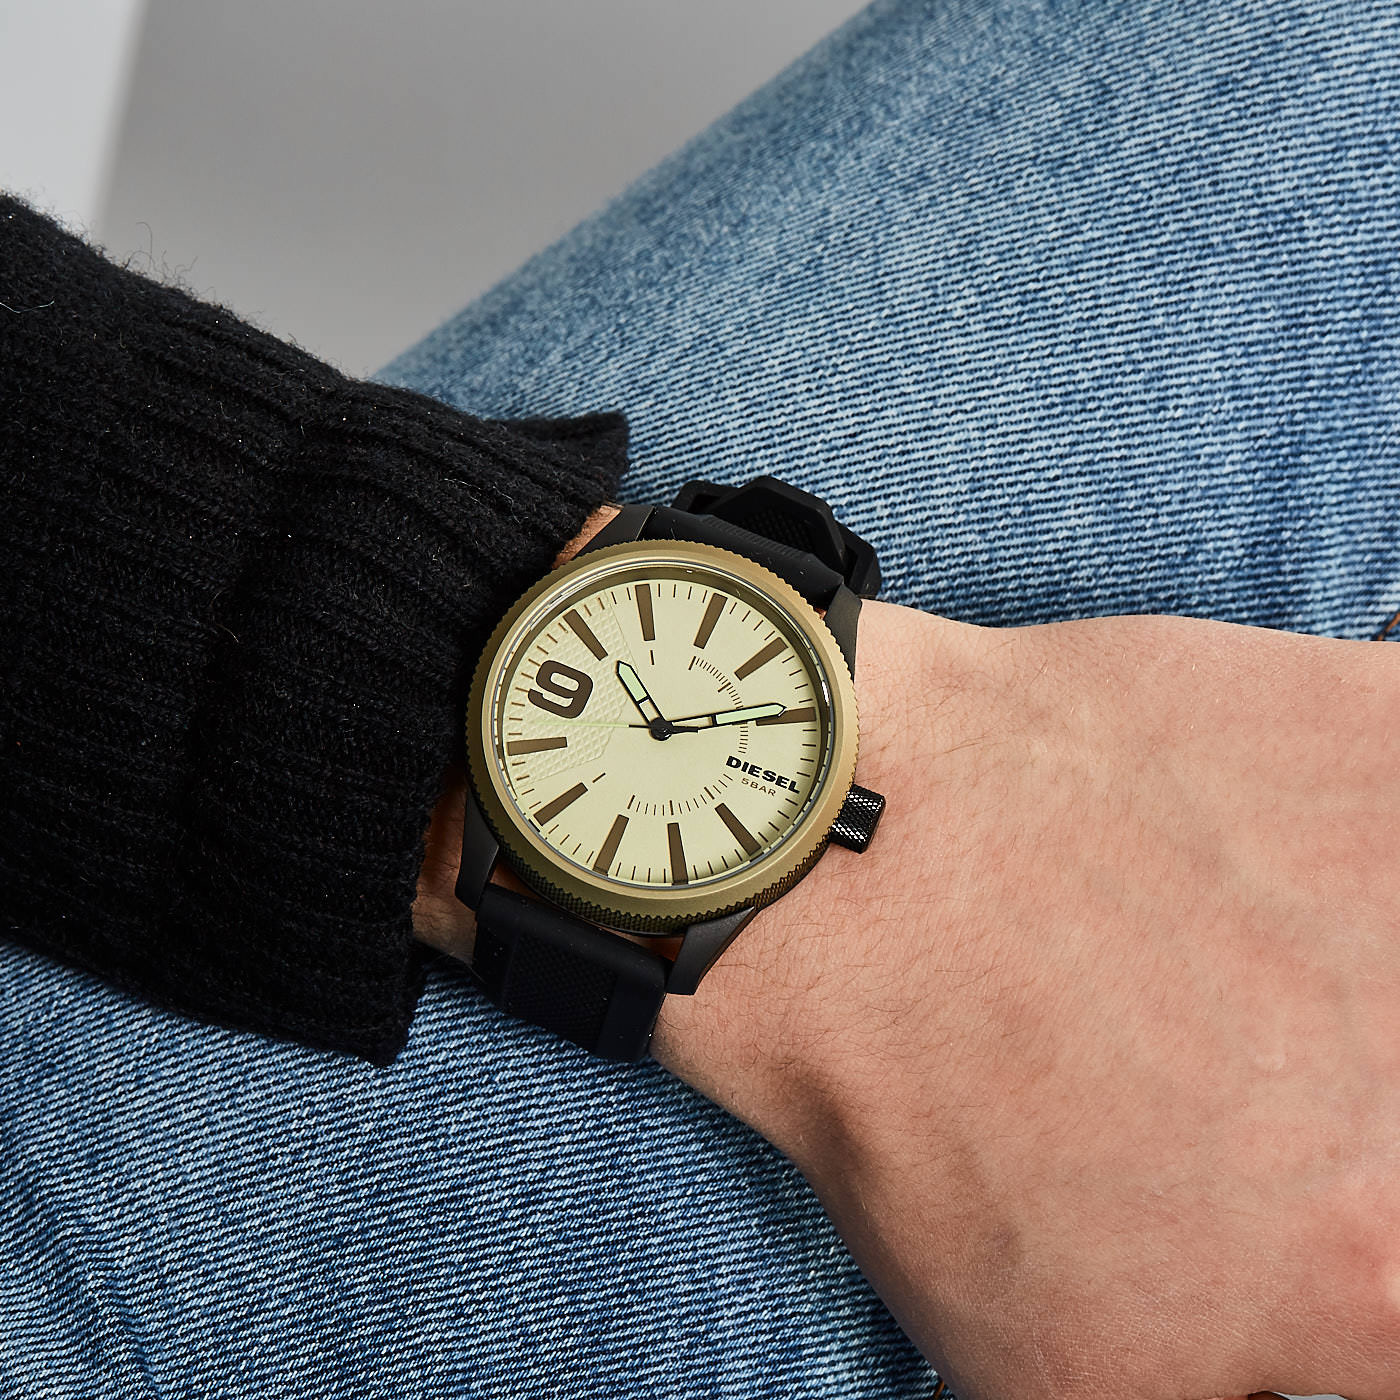 48cbc3af2a29 Diesel Rasp reloj DZ1875 - Relojes